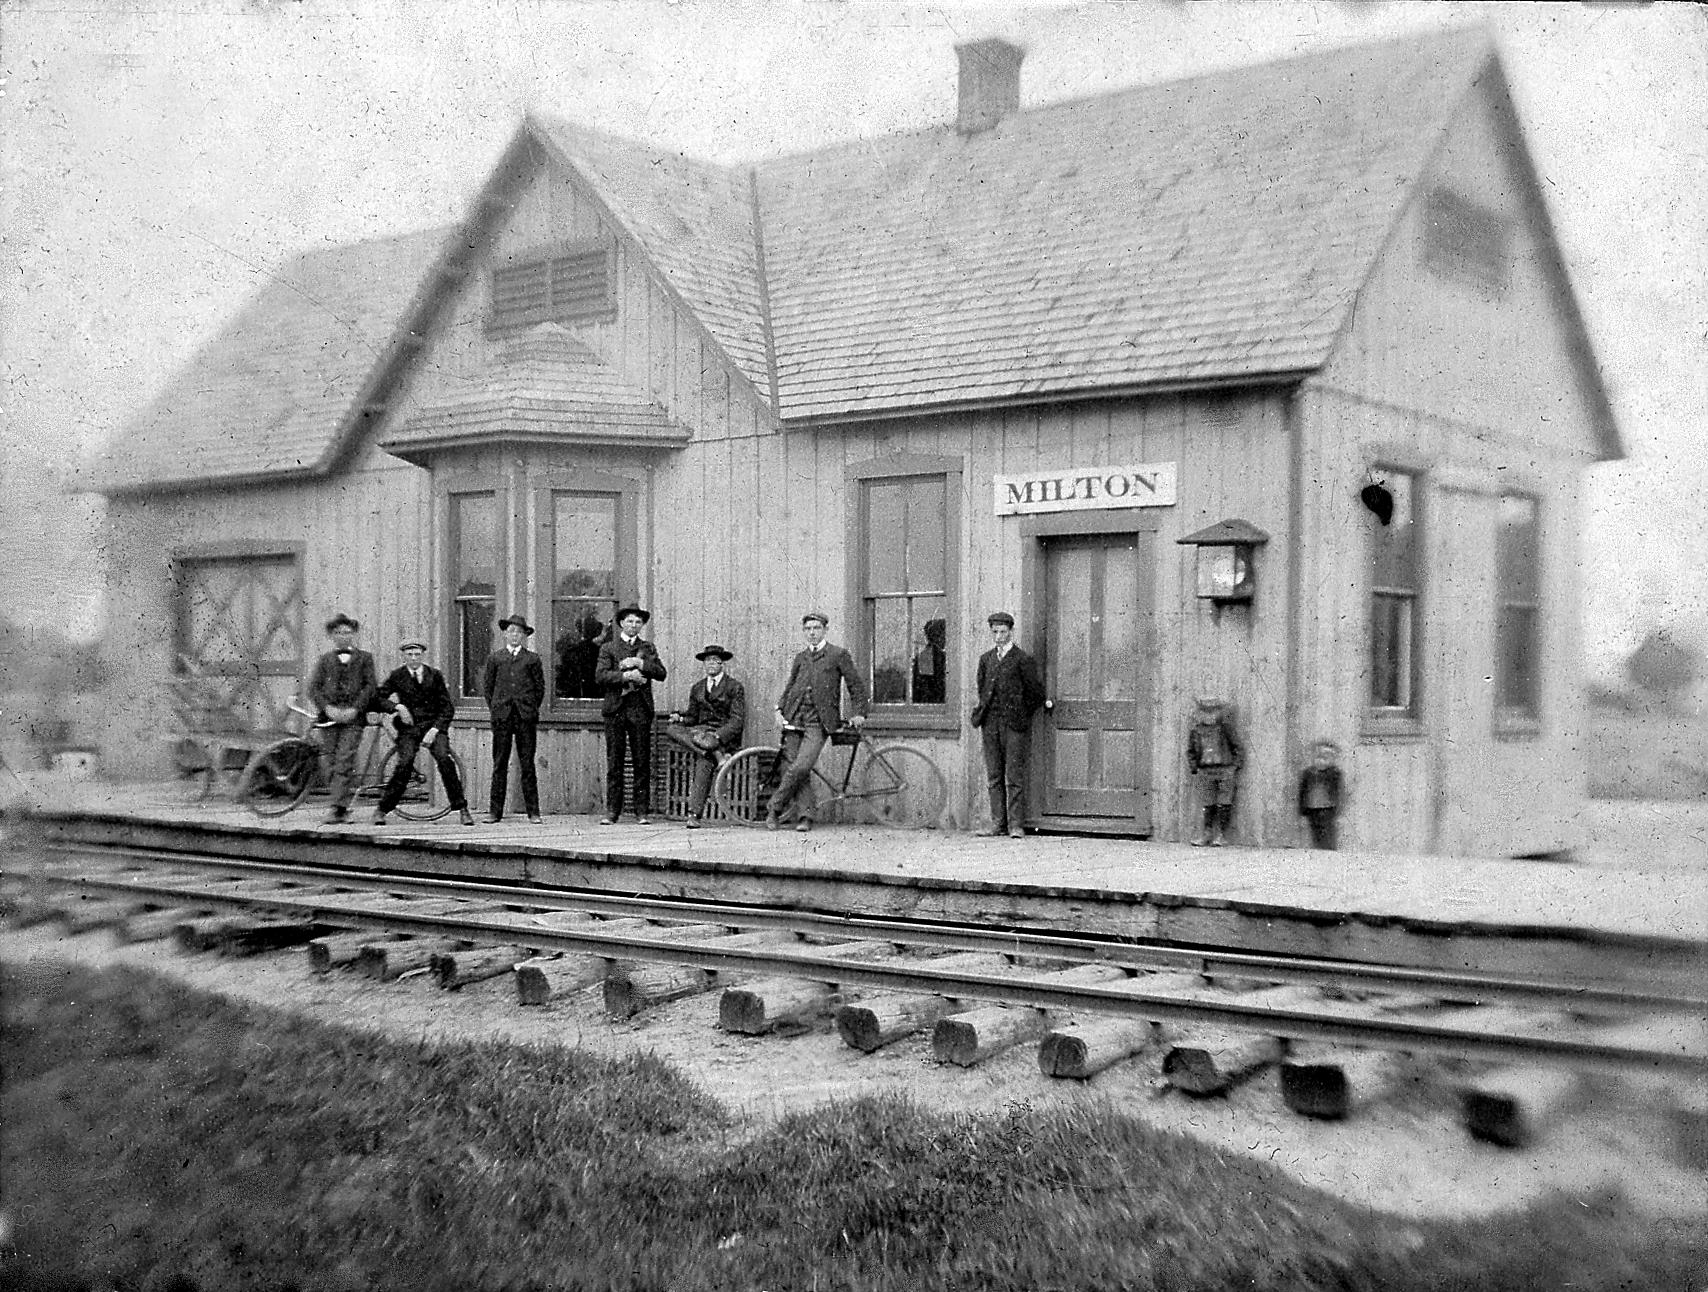 Milton R.R. station, 1904